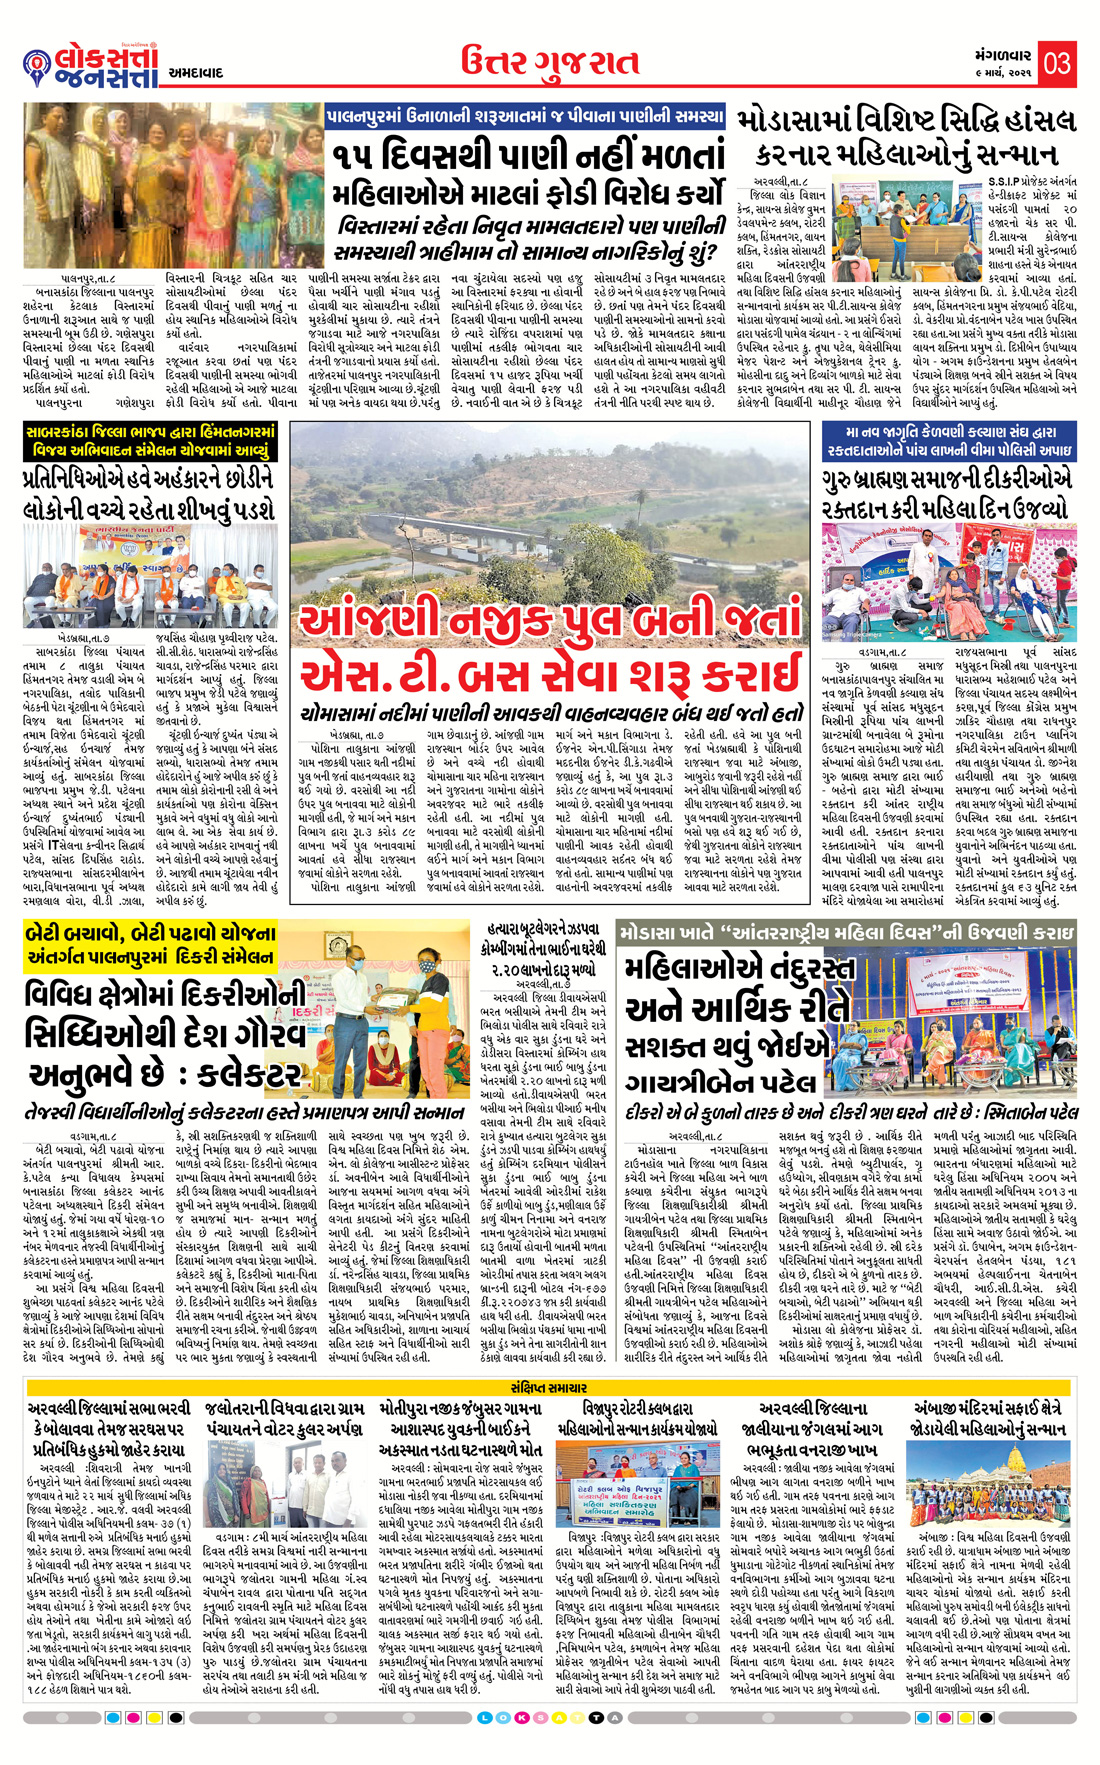 Loksatta Jansatta News Papaer E-paper dated 2021-03-09 | Page 4